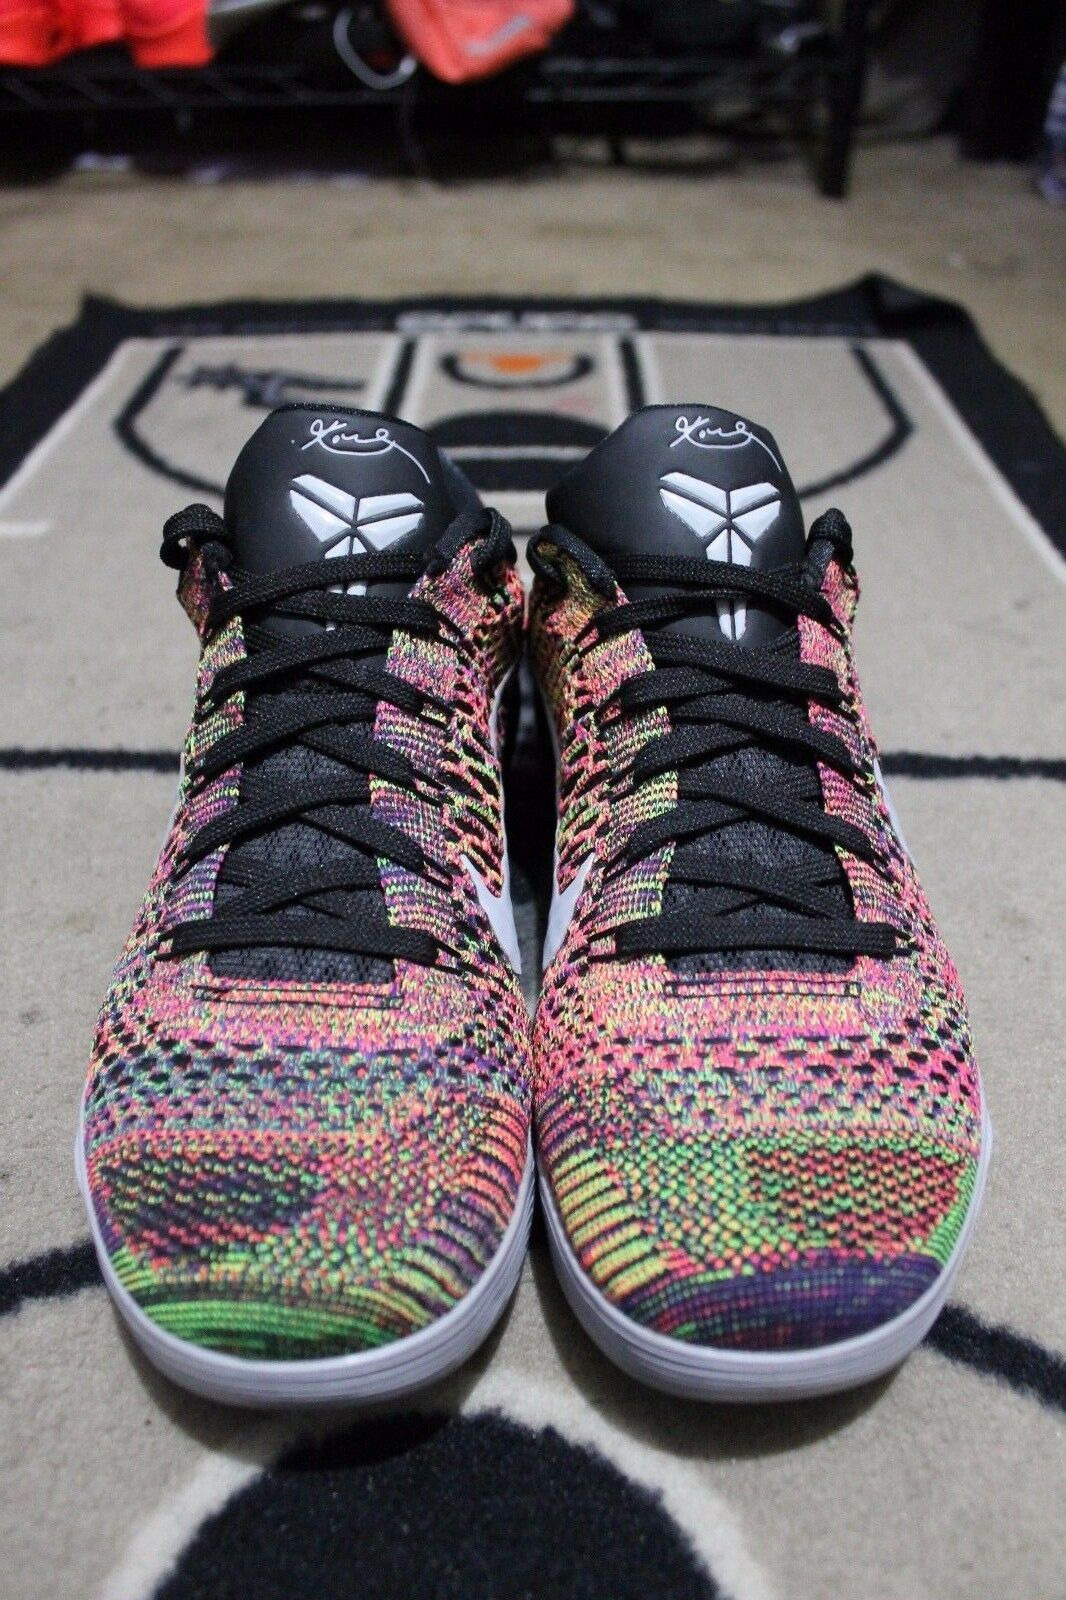 DS Nike iD Kobe 9 Elite Flyknit Mamba Moment SZ 8 Multicolor Grey